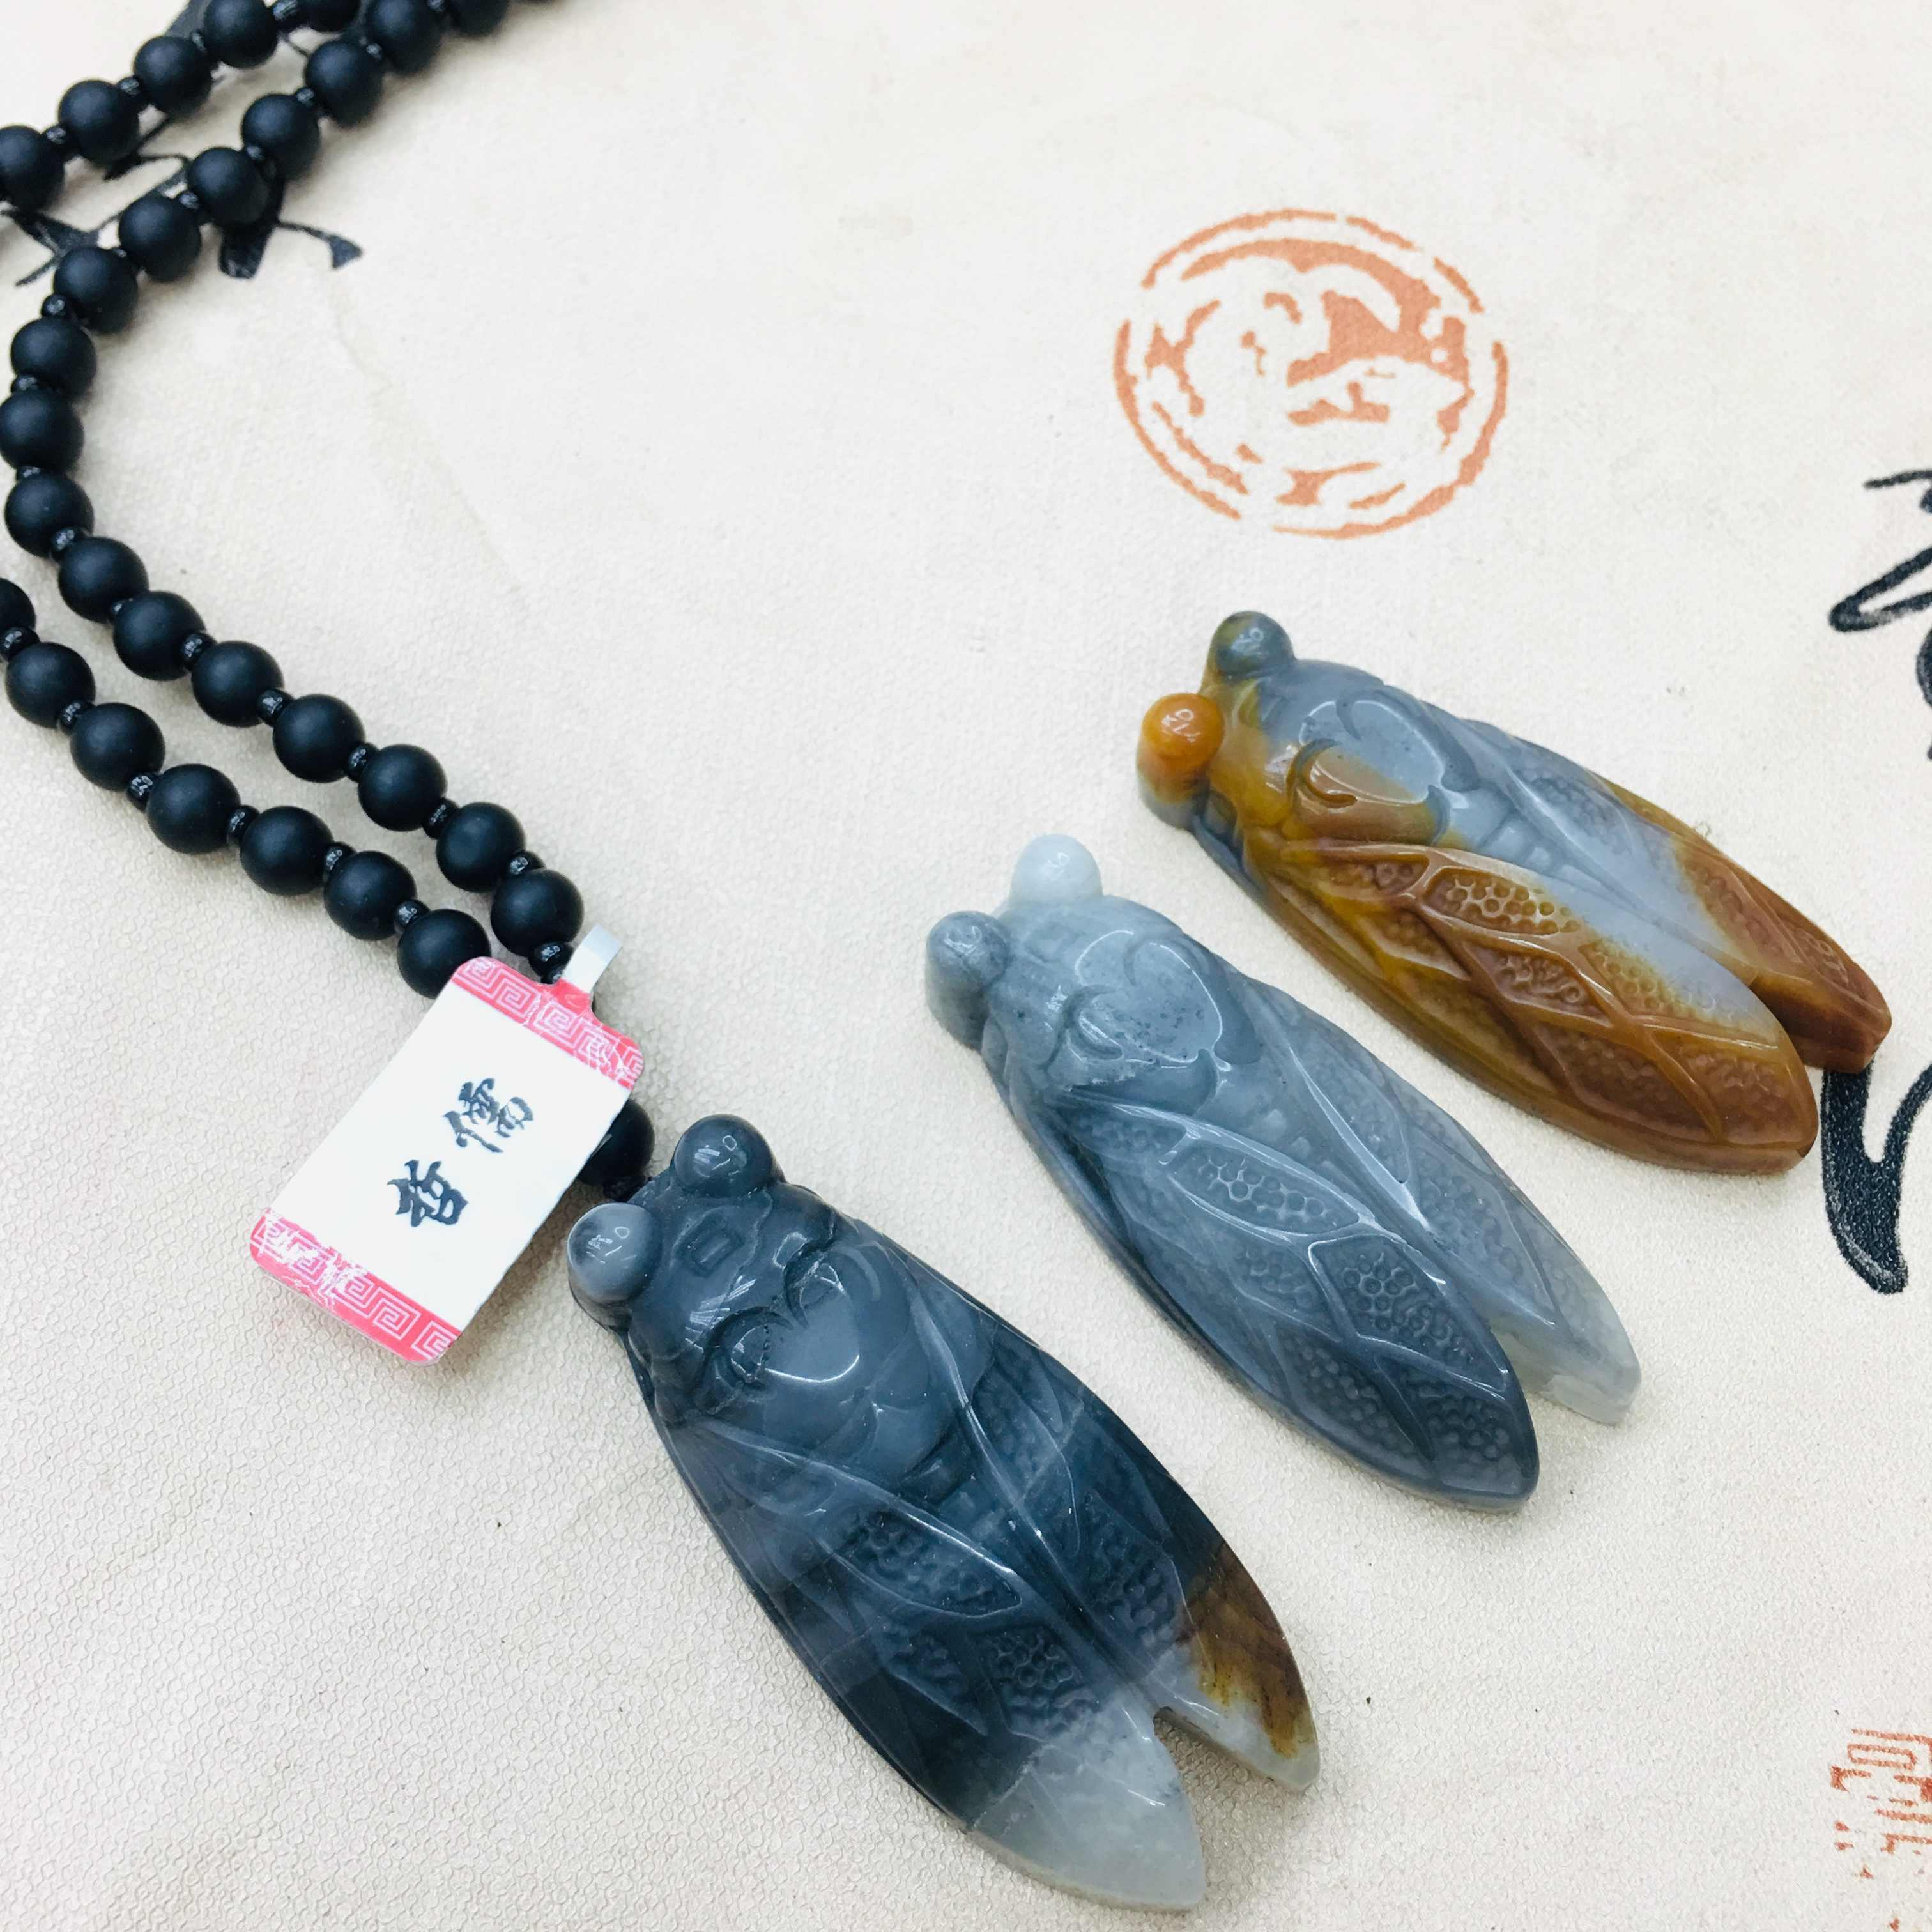 Zheru ナチュラルイエロードラゴン翡翠彫刻多色翡翠蝉ペンダント黒曜石ネックレスの男性と女性のセーターチェーン